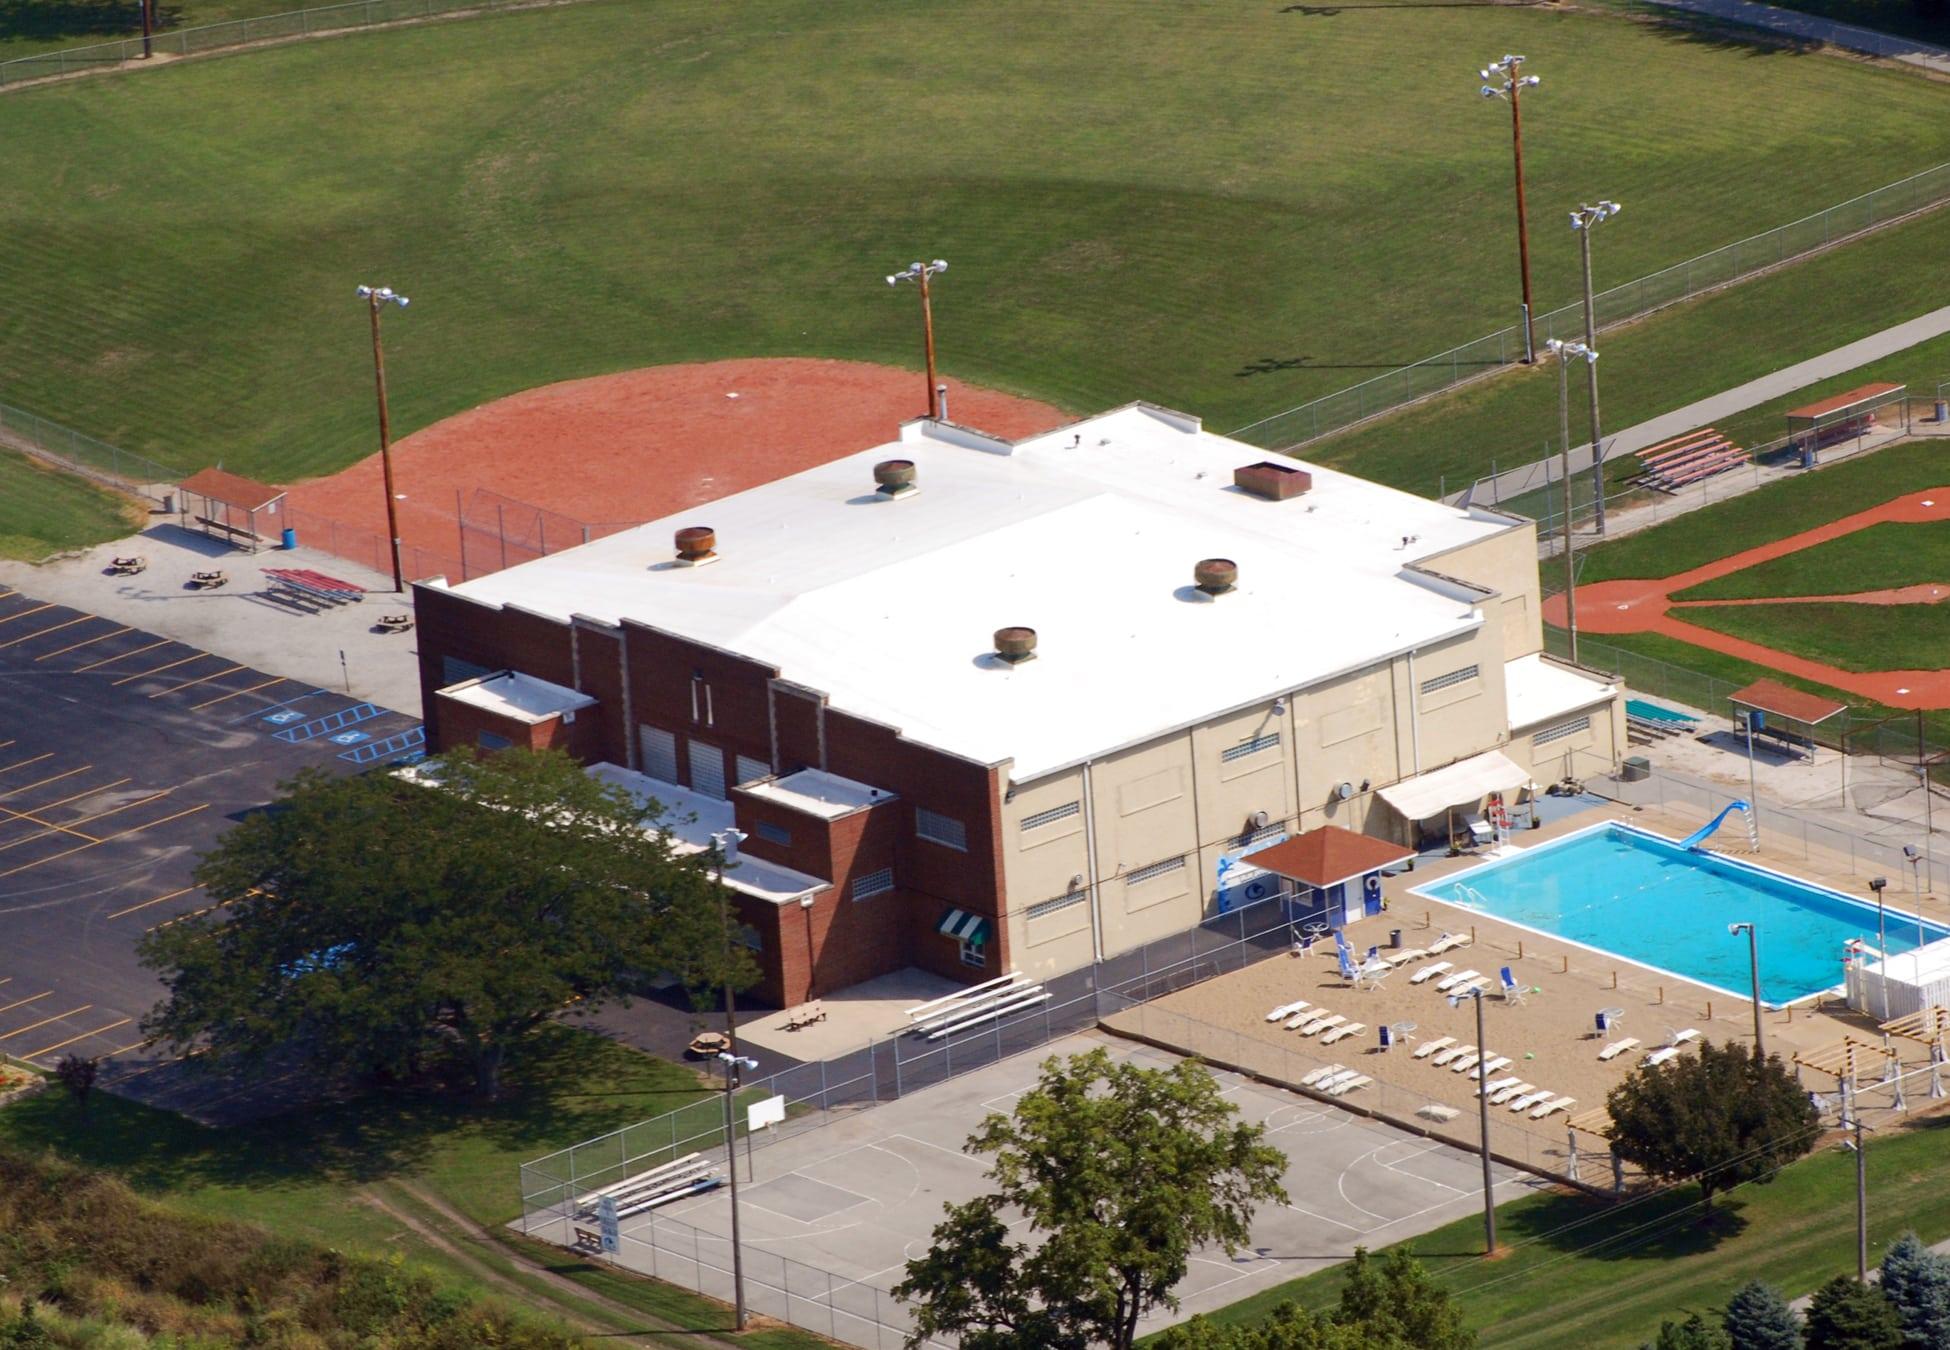 Duro Last Flat Roof Community Center Kentland, Indiana